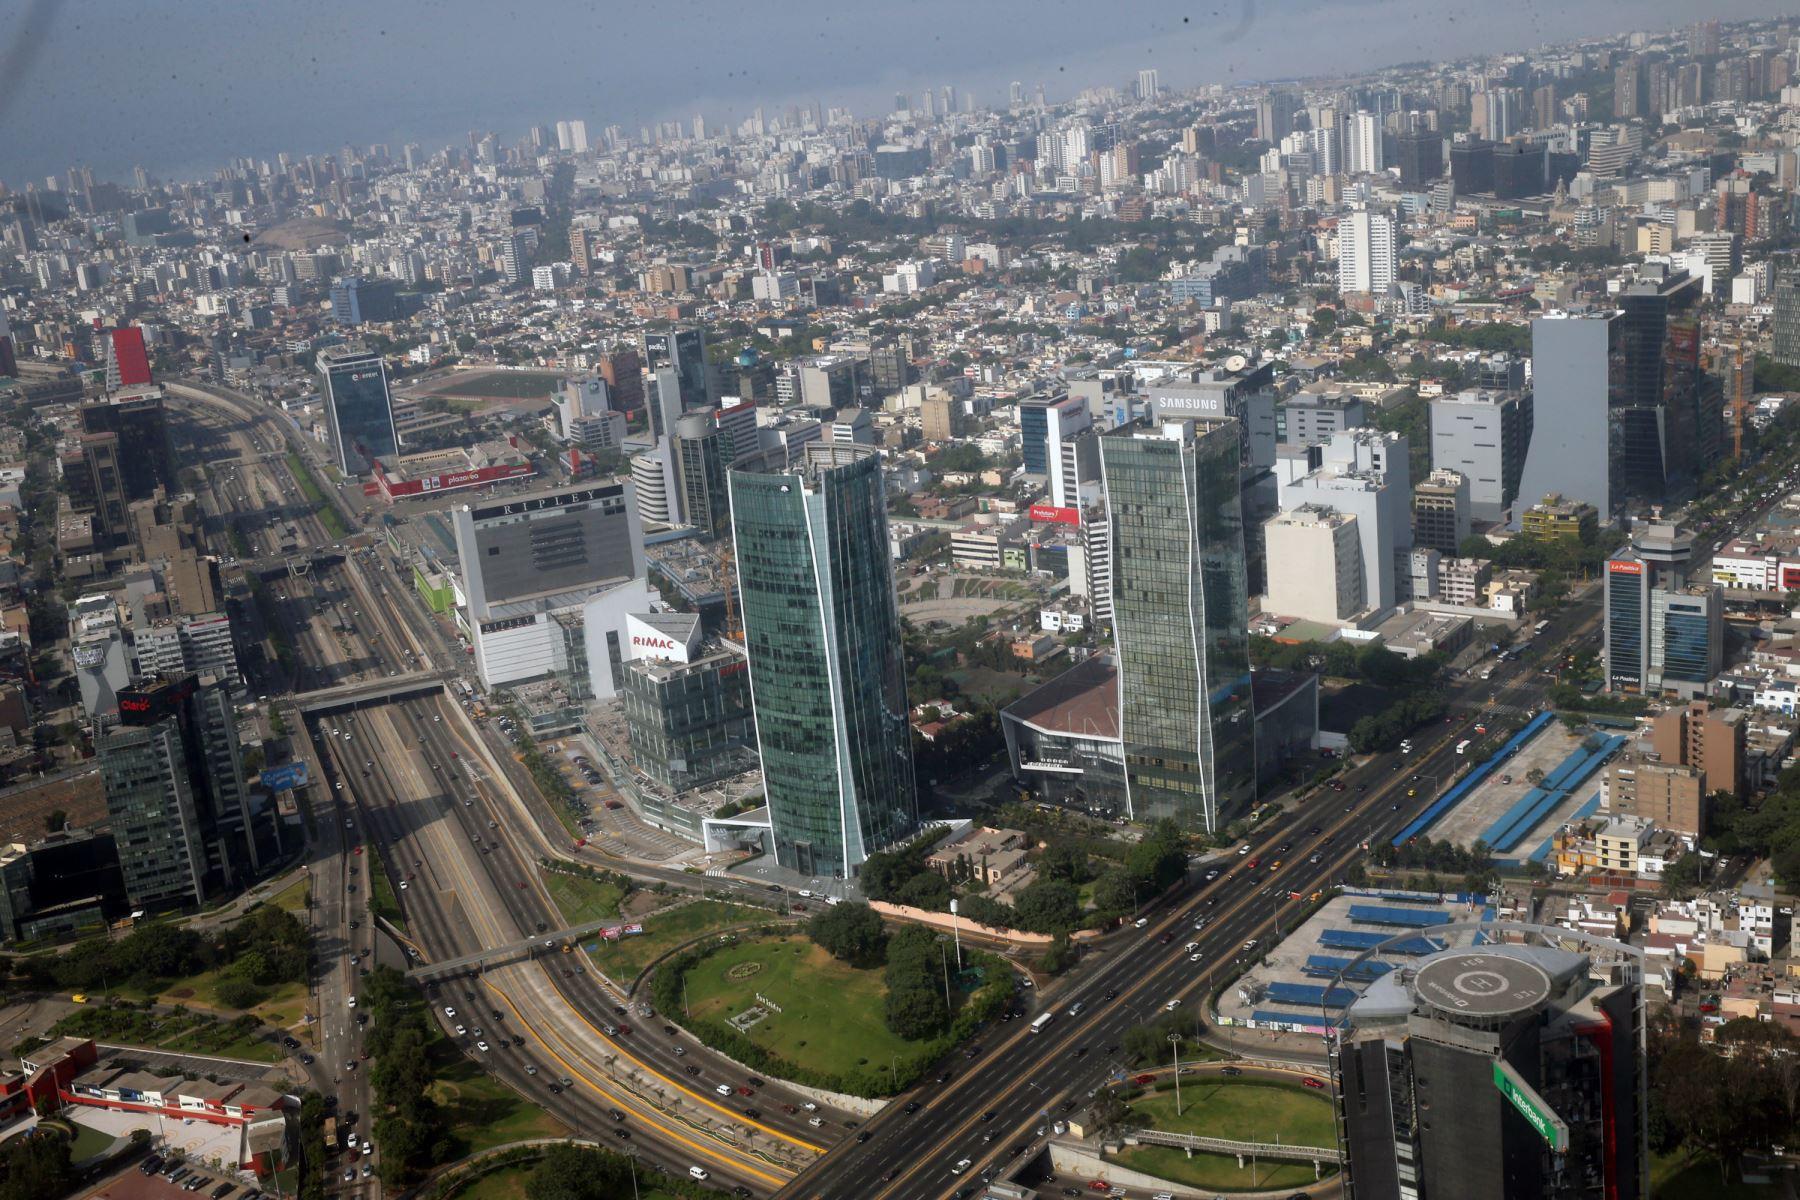 61-considera-que-la-economia-peruana-se-recuperara-el-proximo-ano-segun-la-encuesta-del-poder